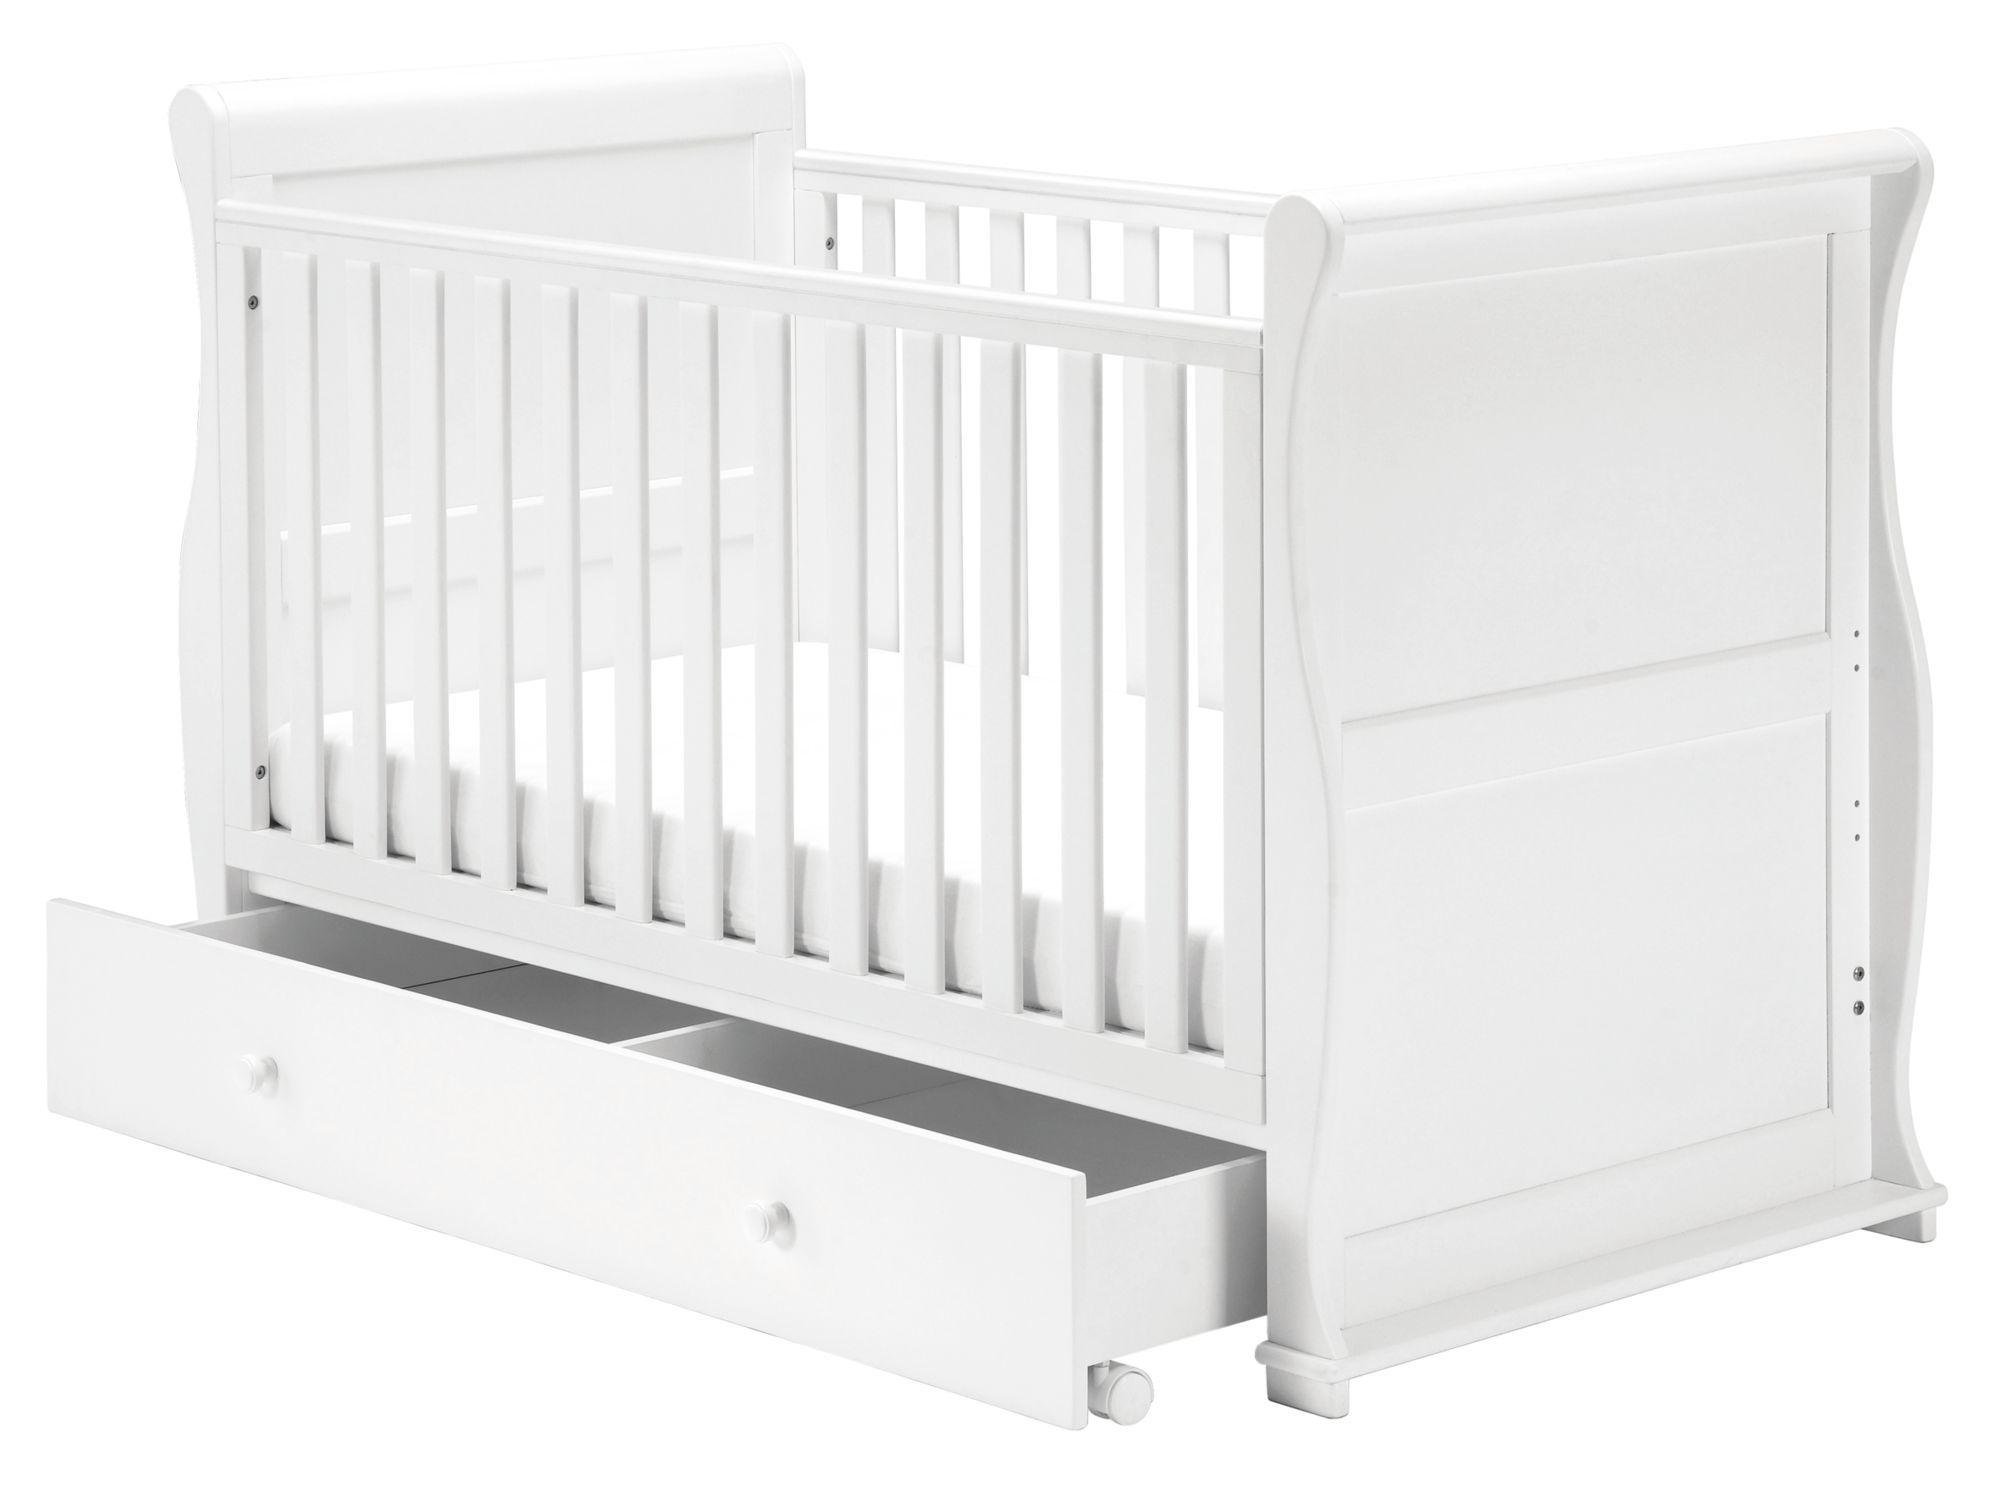 - East Coast Nursery Alaska White Sleigh Cot Bed - White Baby